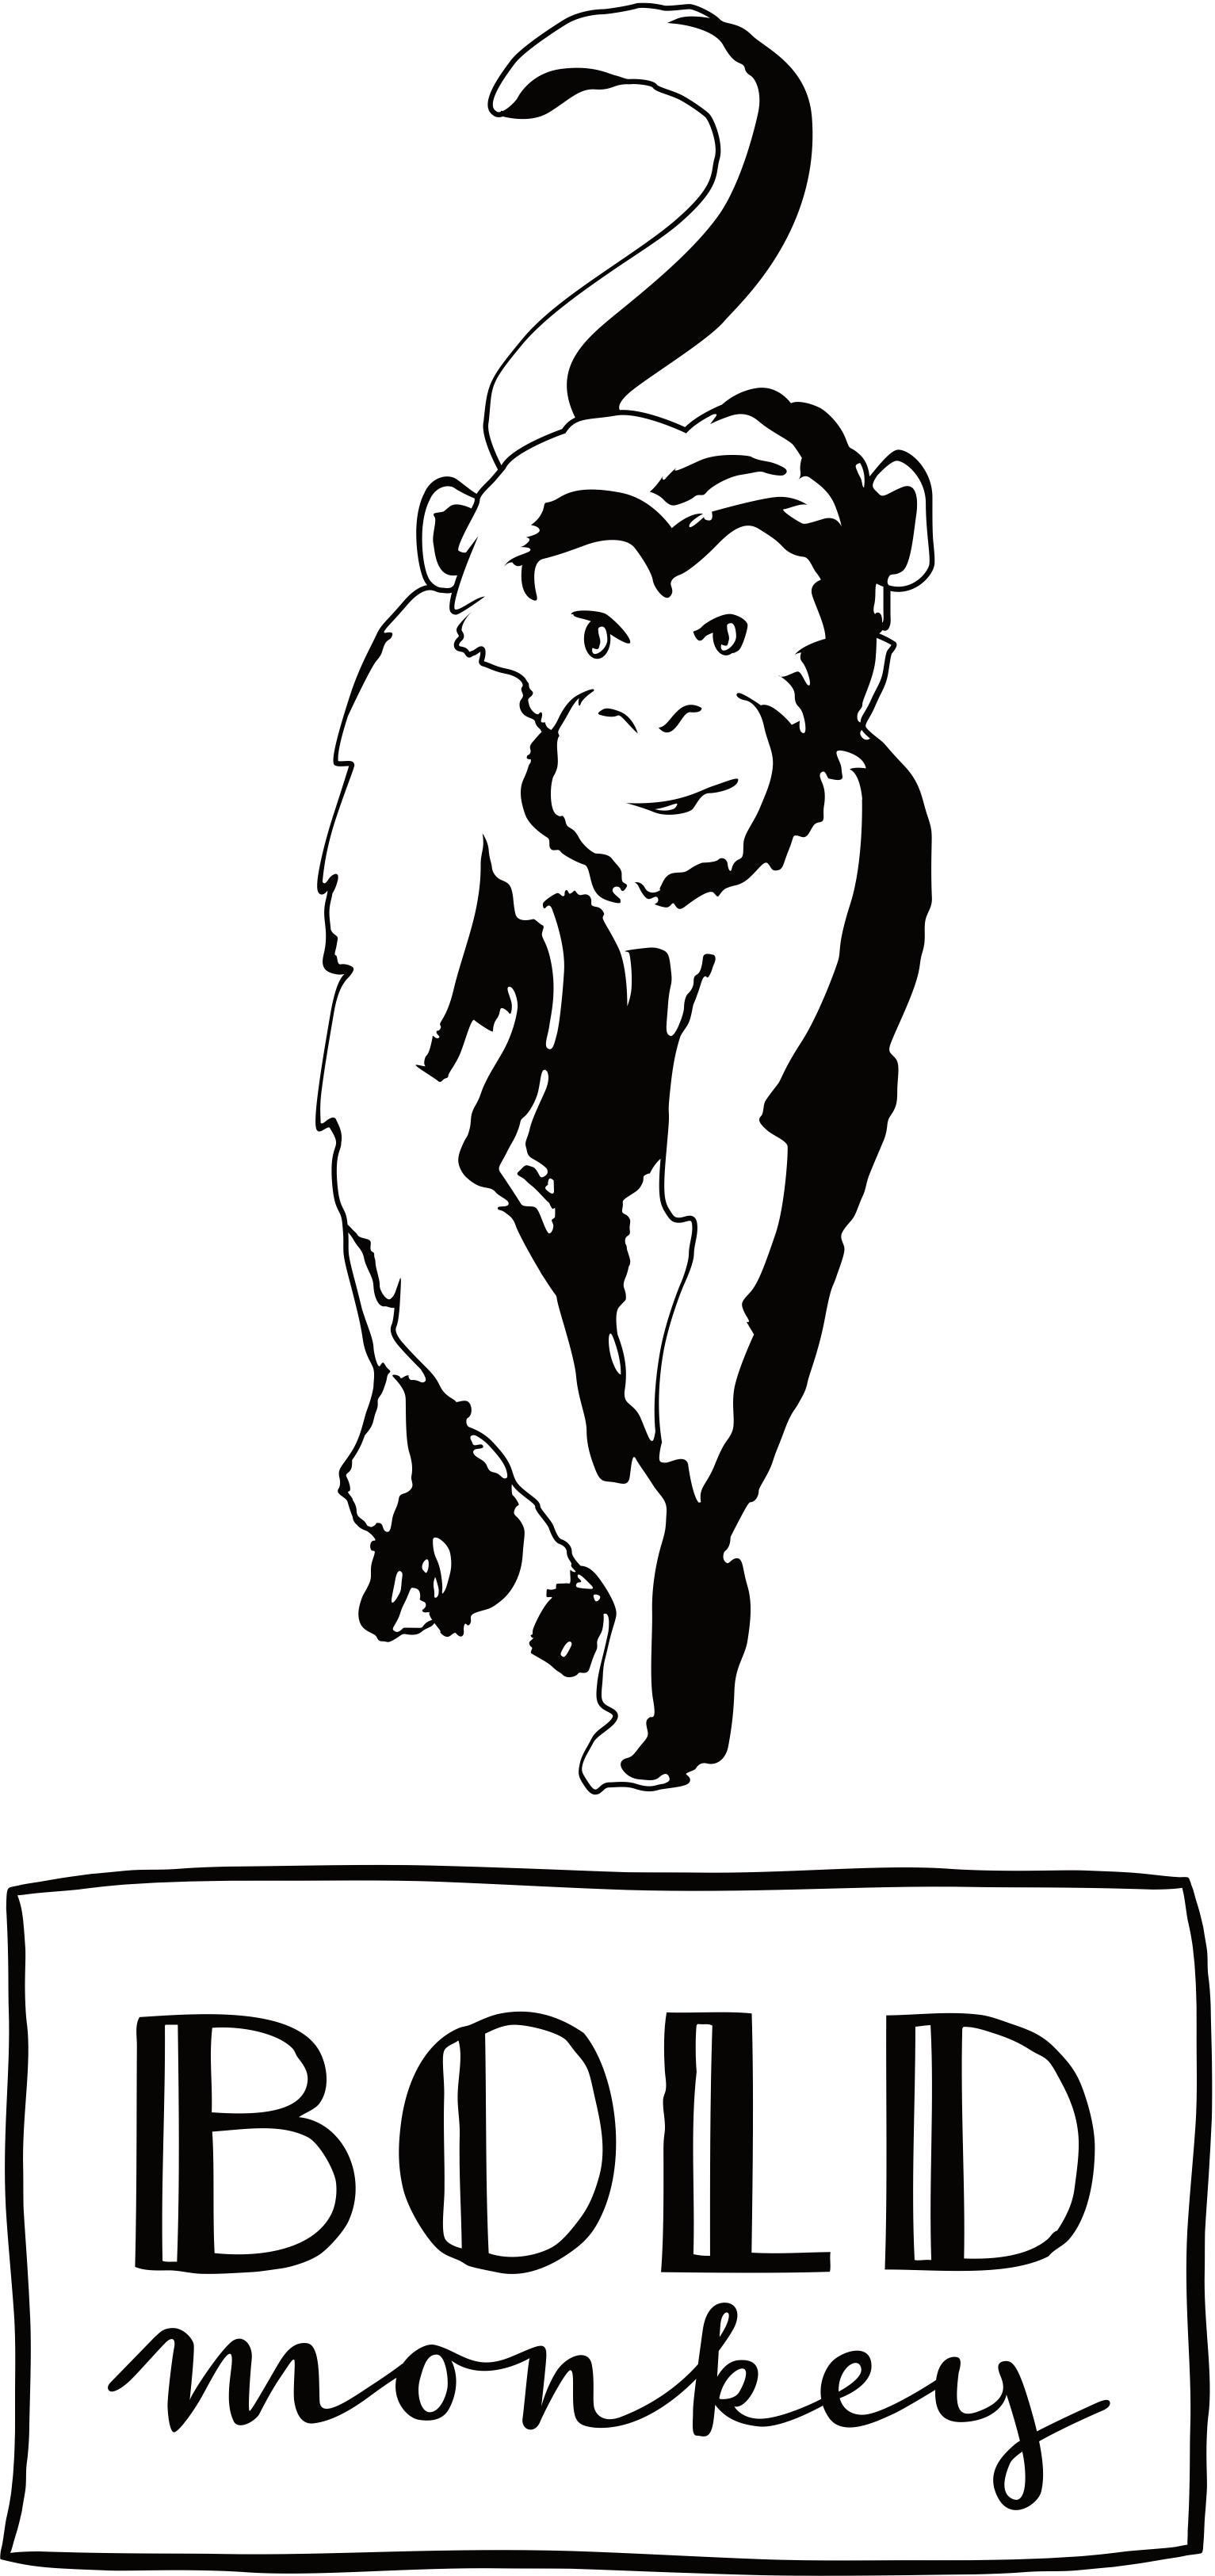 Ordinaire Bold Monkey